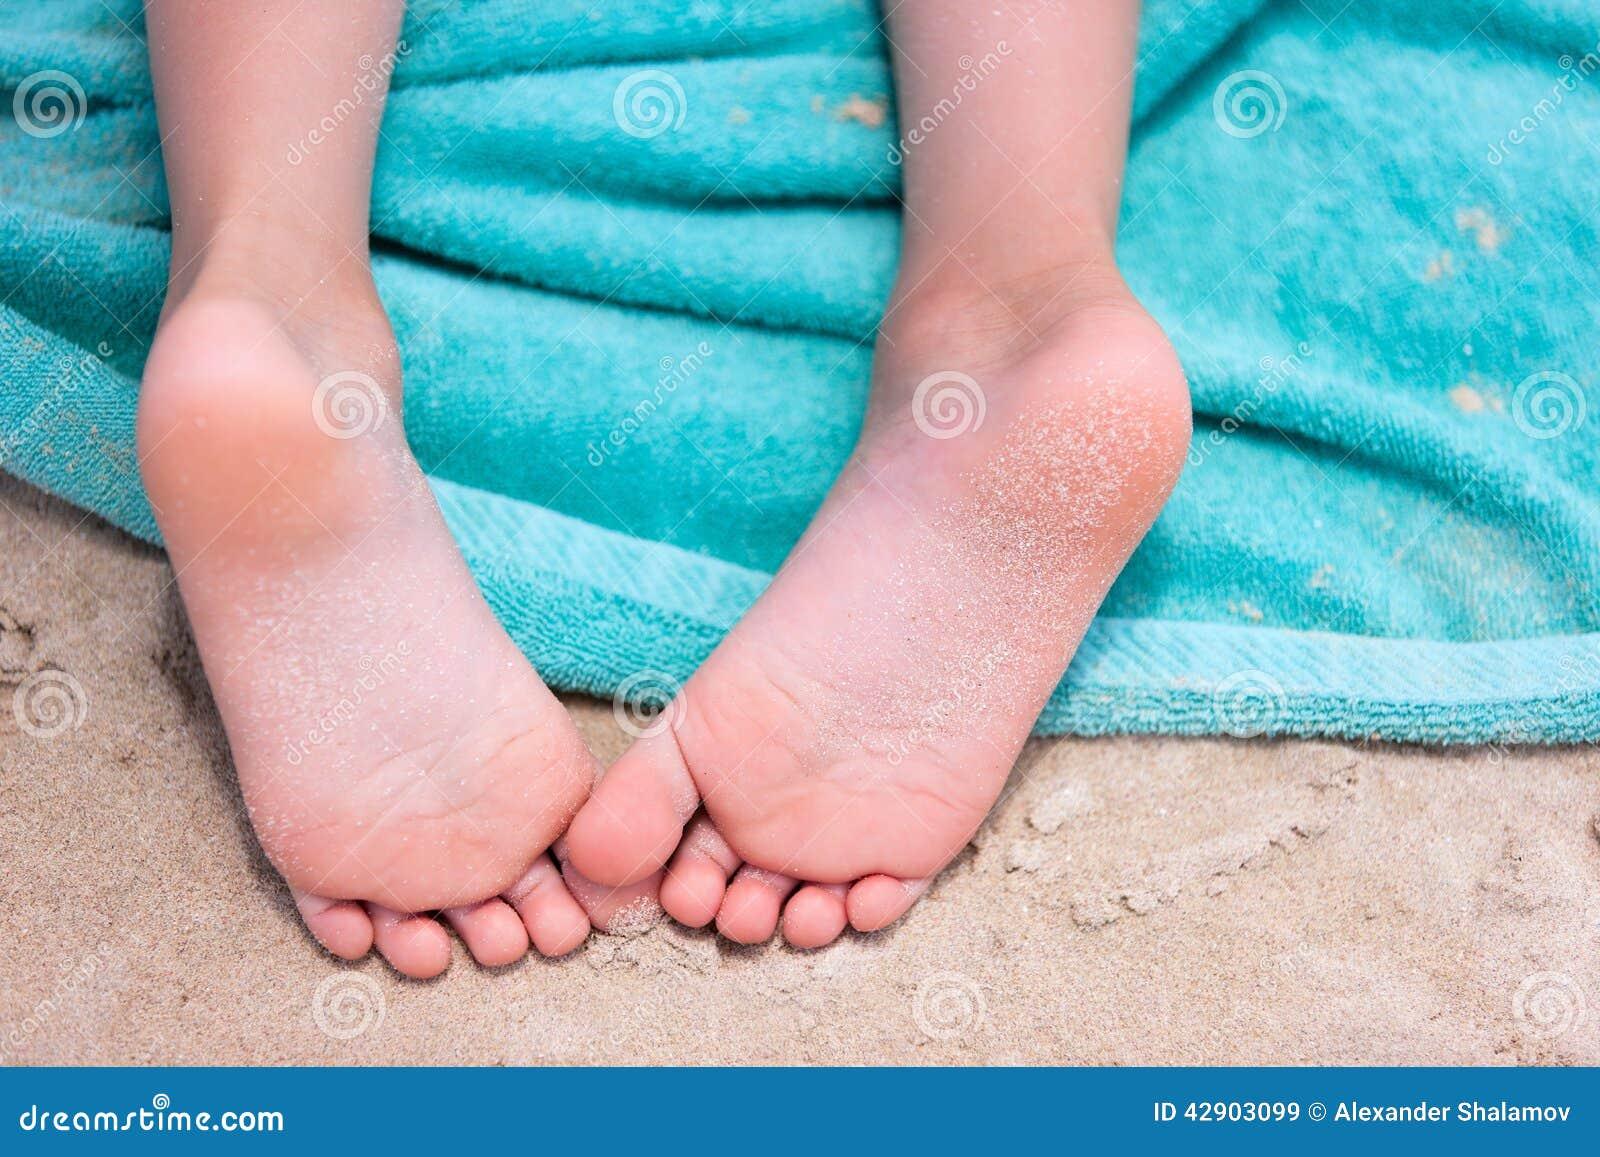 up soles Girl close feet